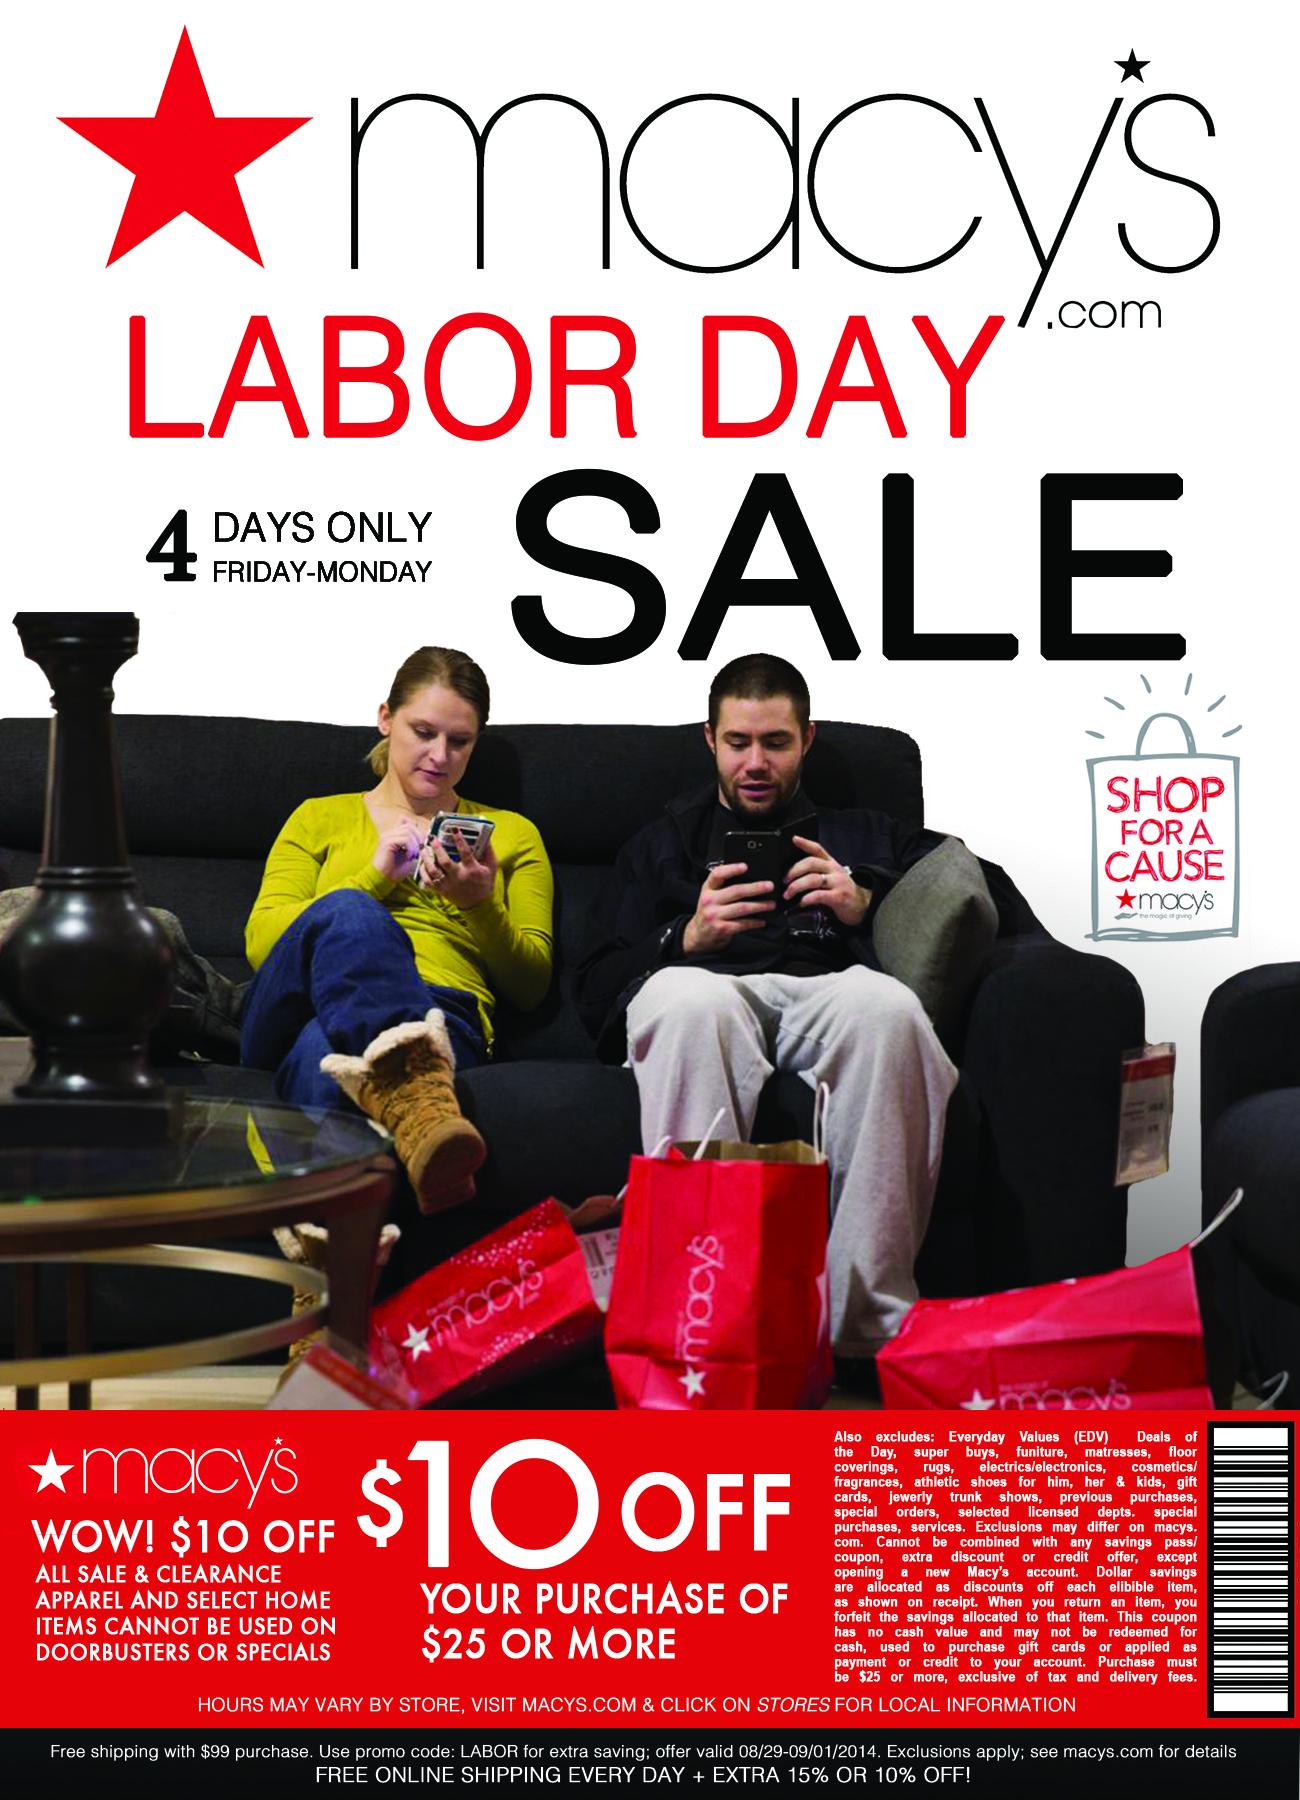 Macy's Labor Day Sale